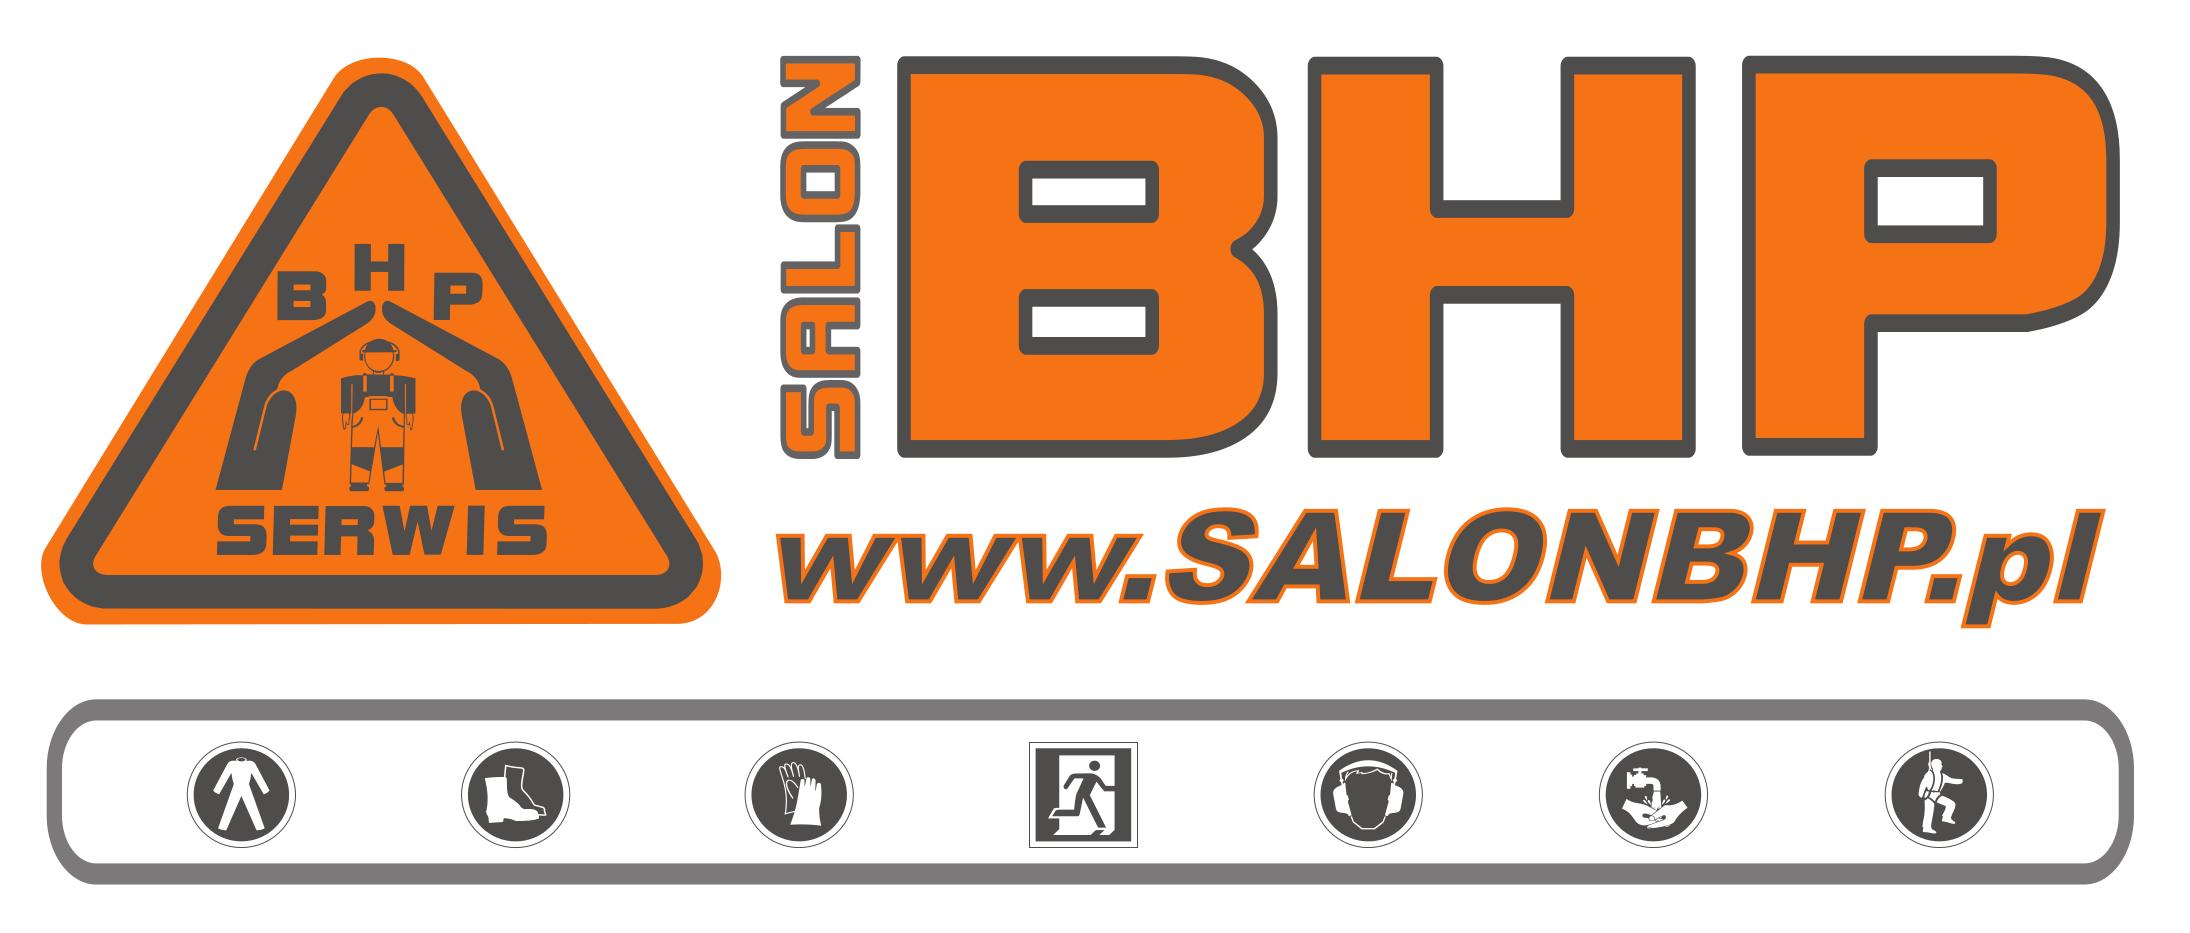 Logo Bogmar 2014 zpchr